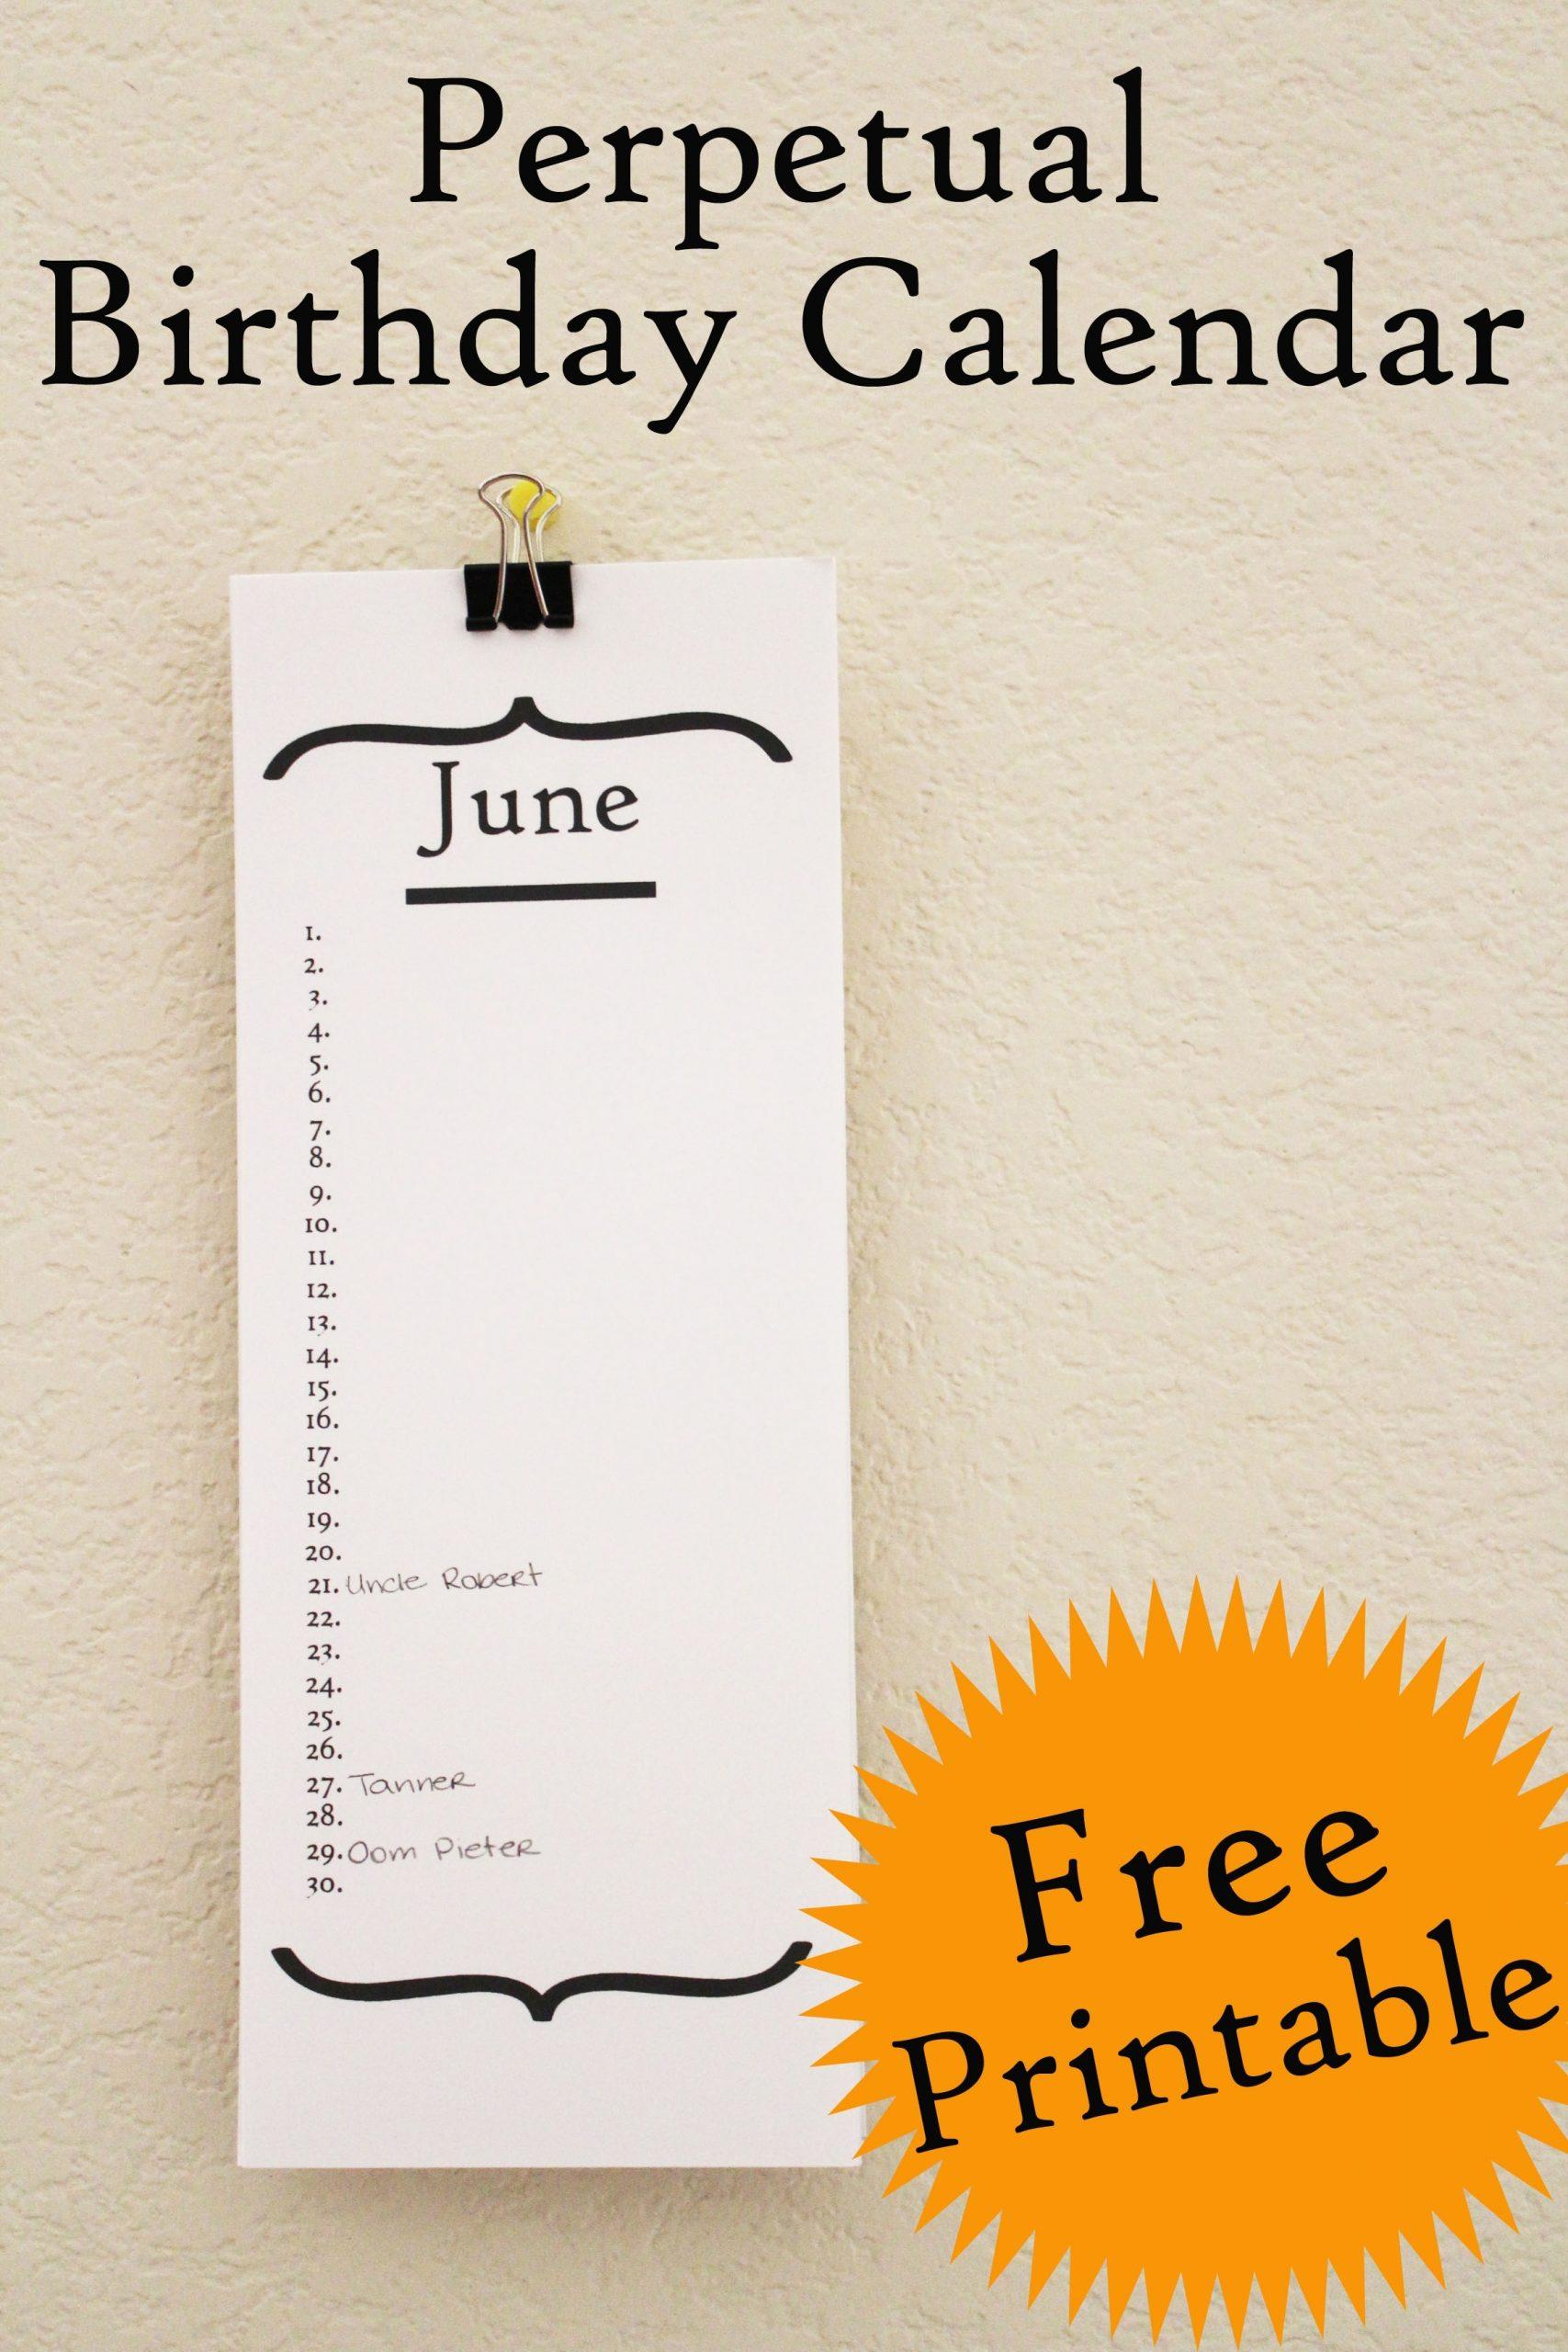 Free Birthday Calendar Printable - 30 Minute Crafts